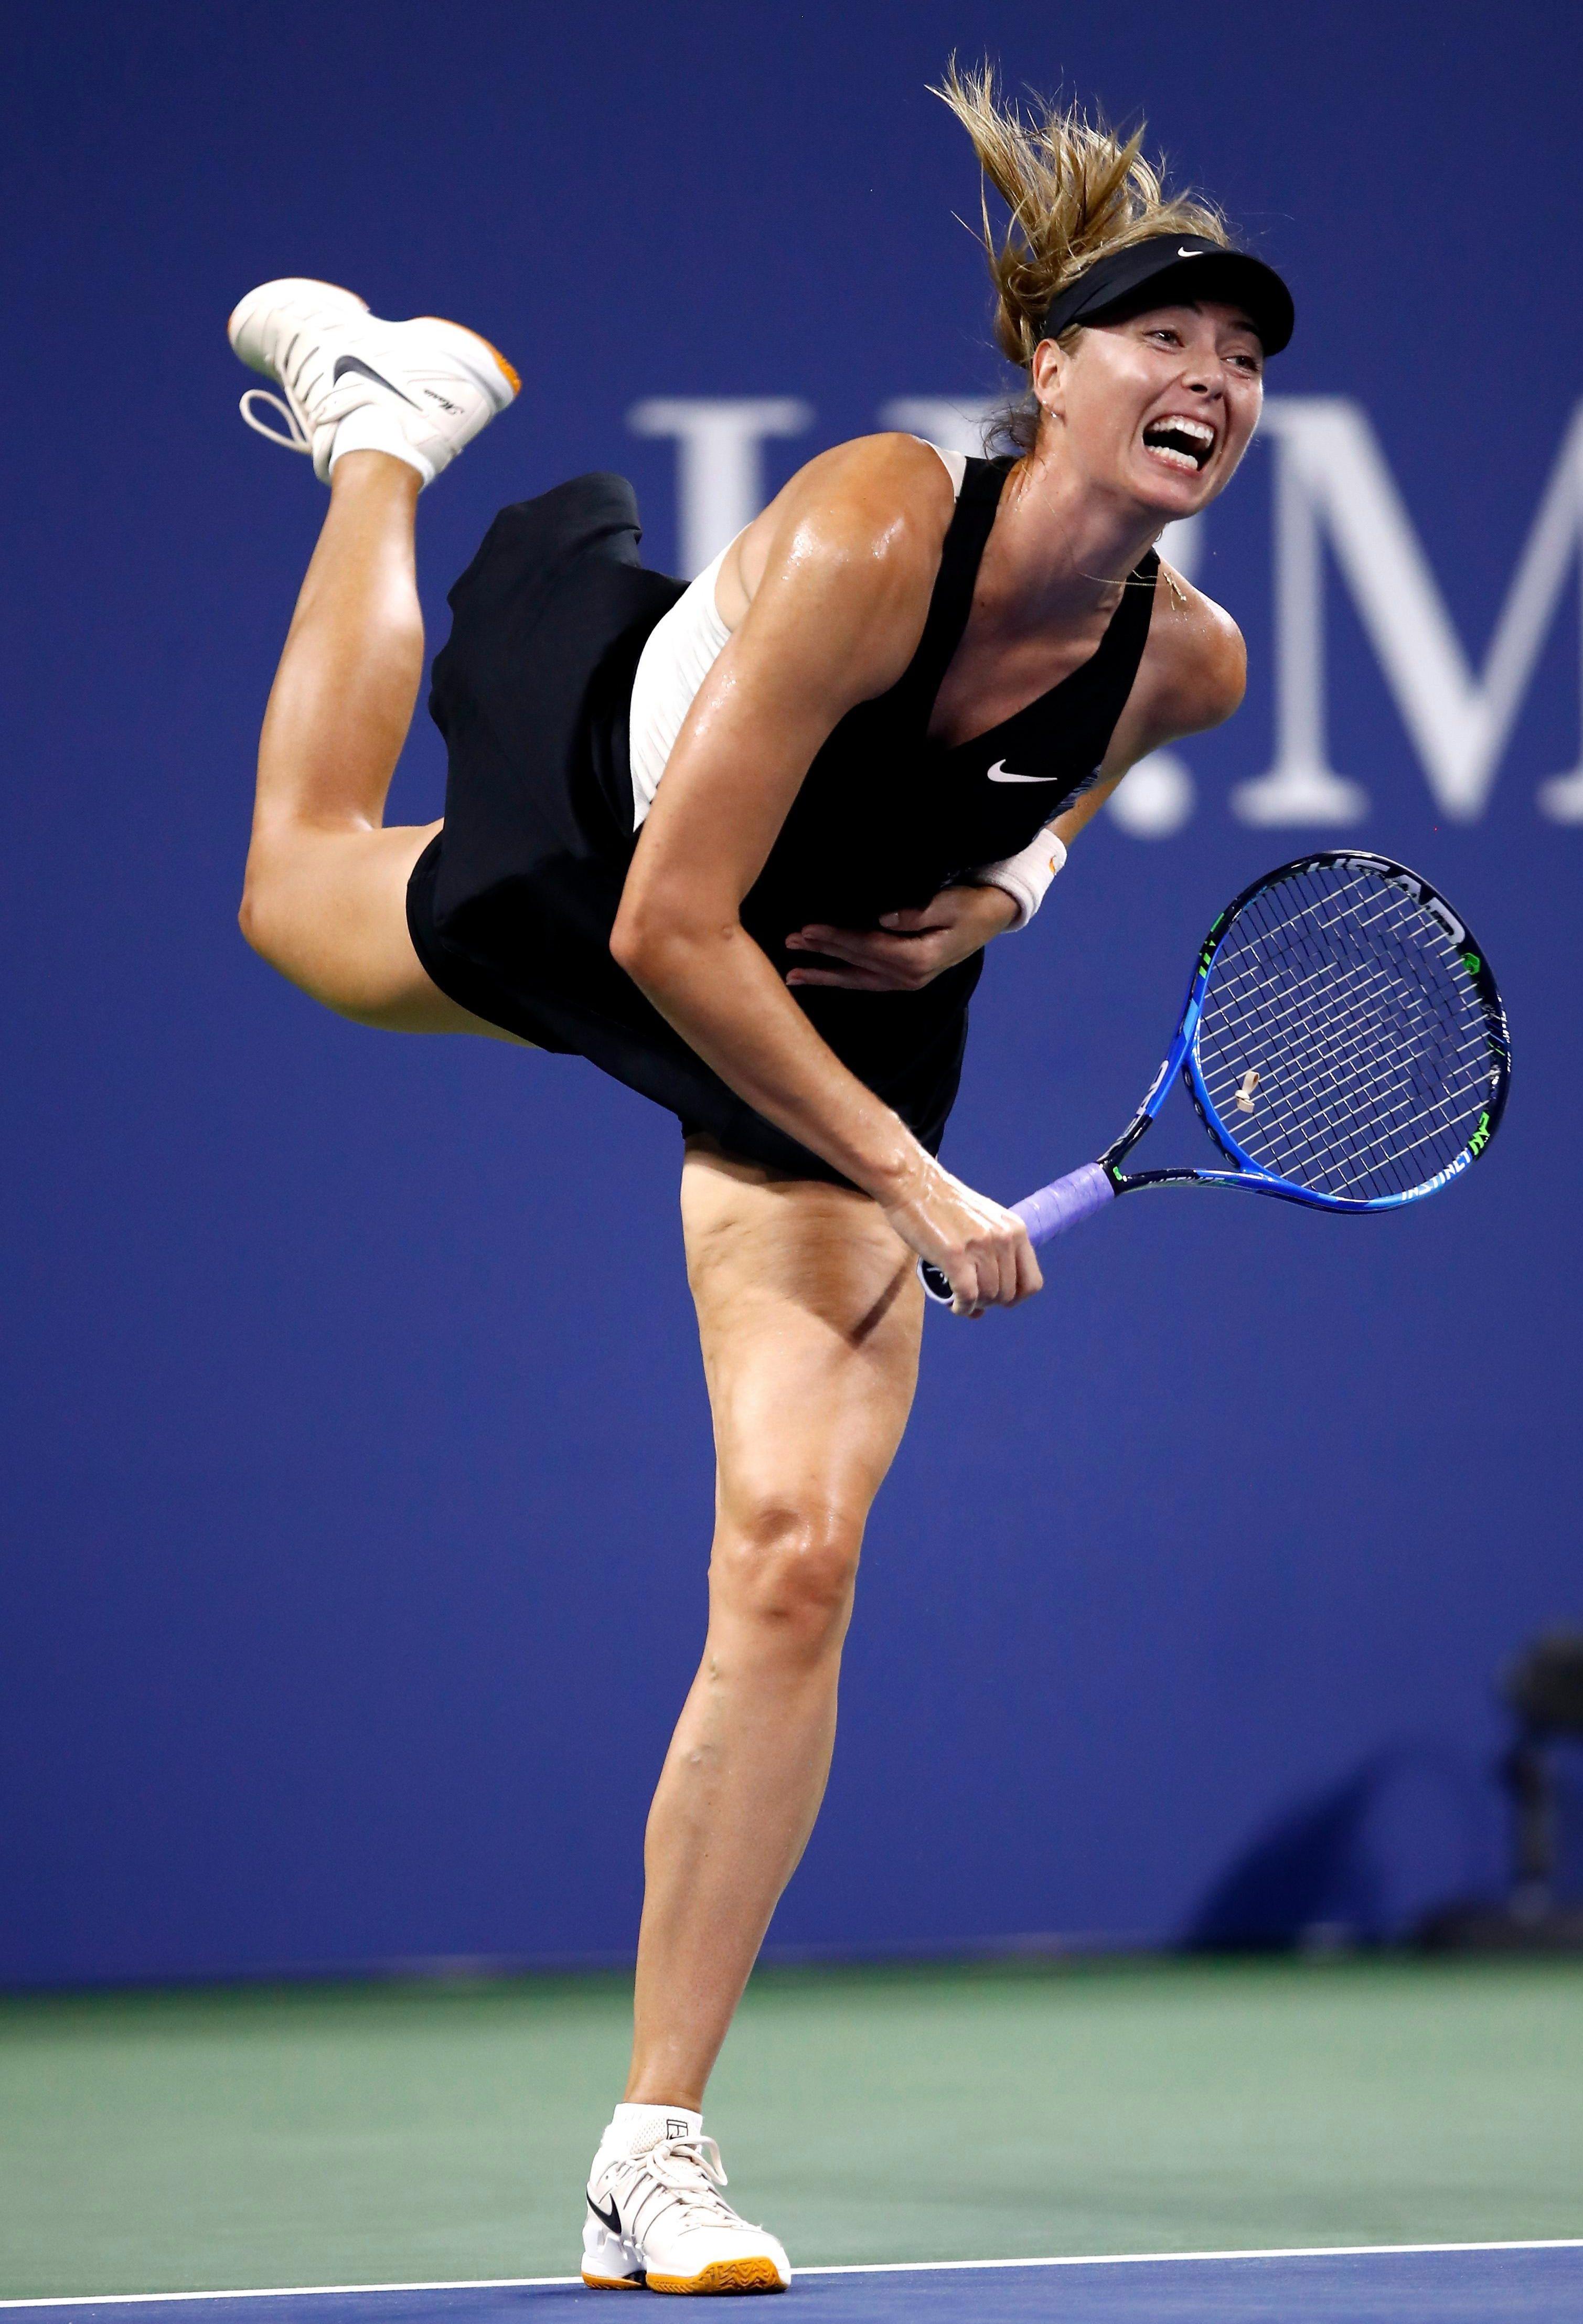 Maria Sharapova fires in a serve in New York